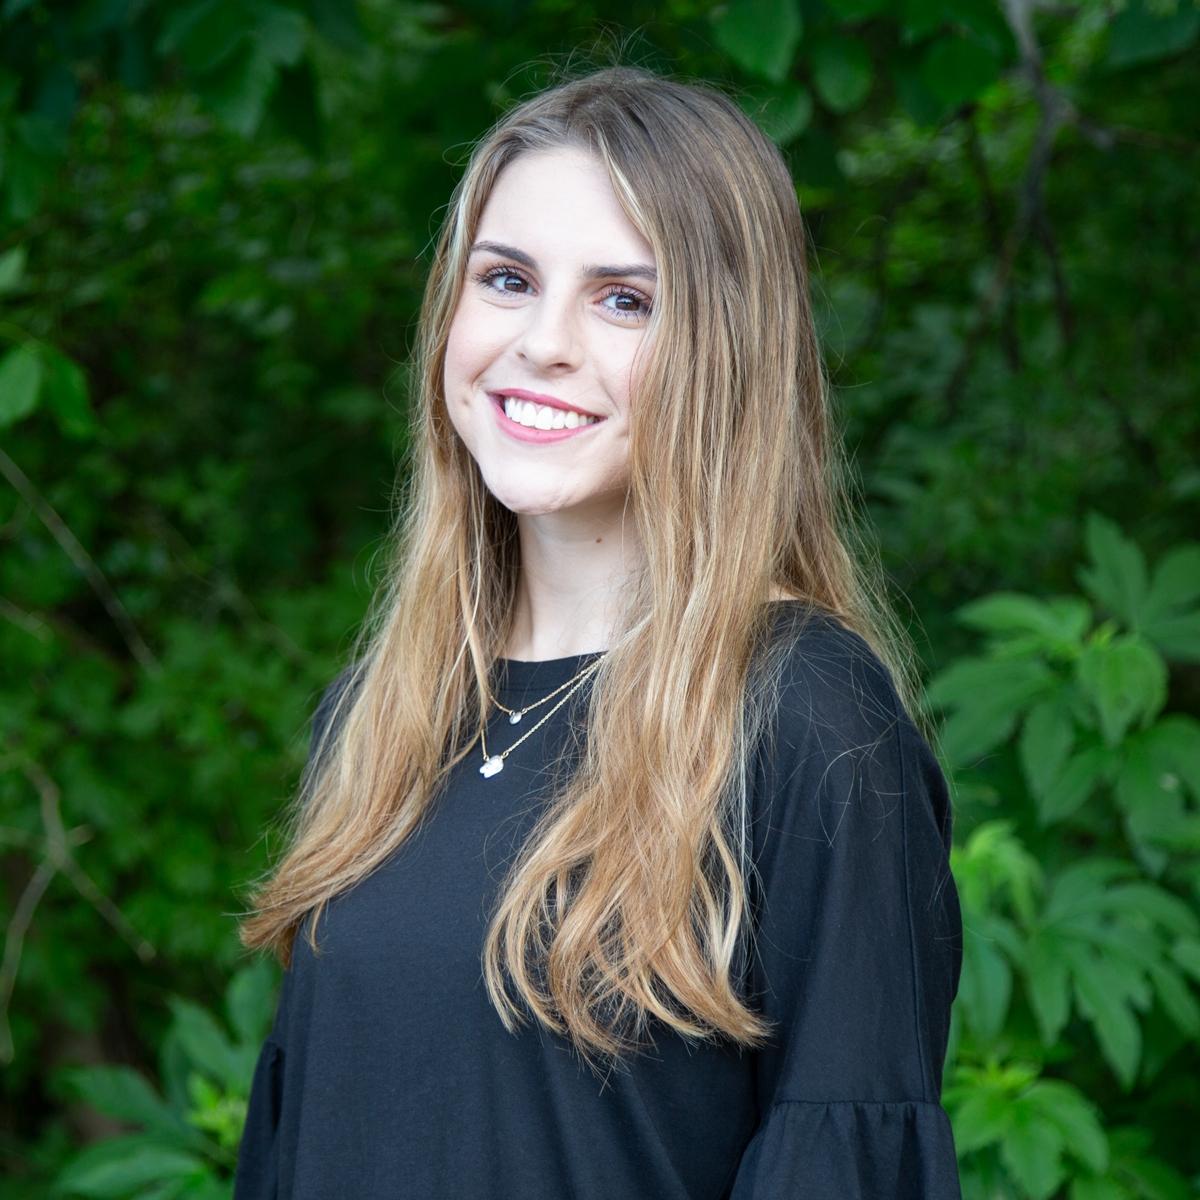 Samantha Salter